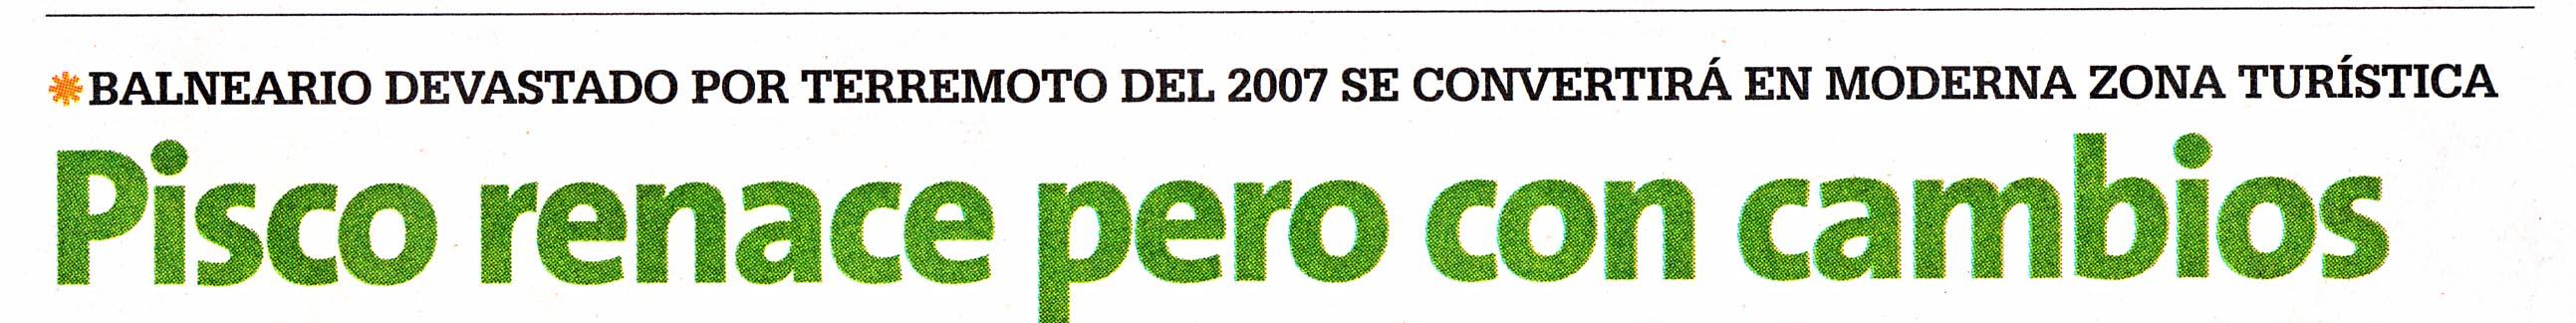 Diario 16 difunde Propuesta Yo Soy Pisco